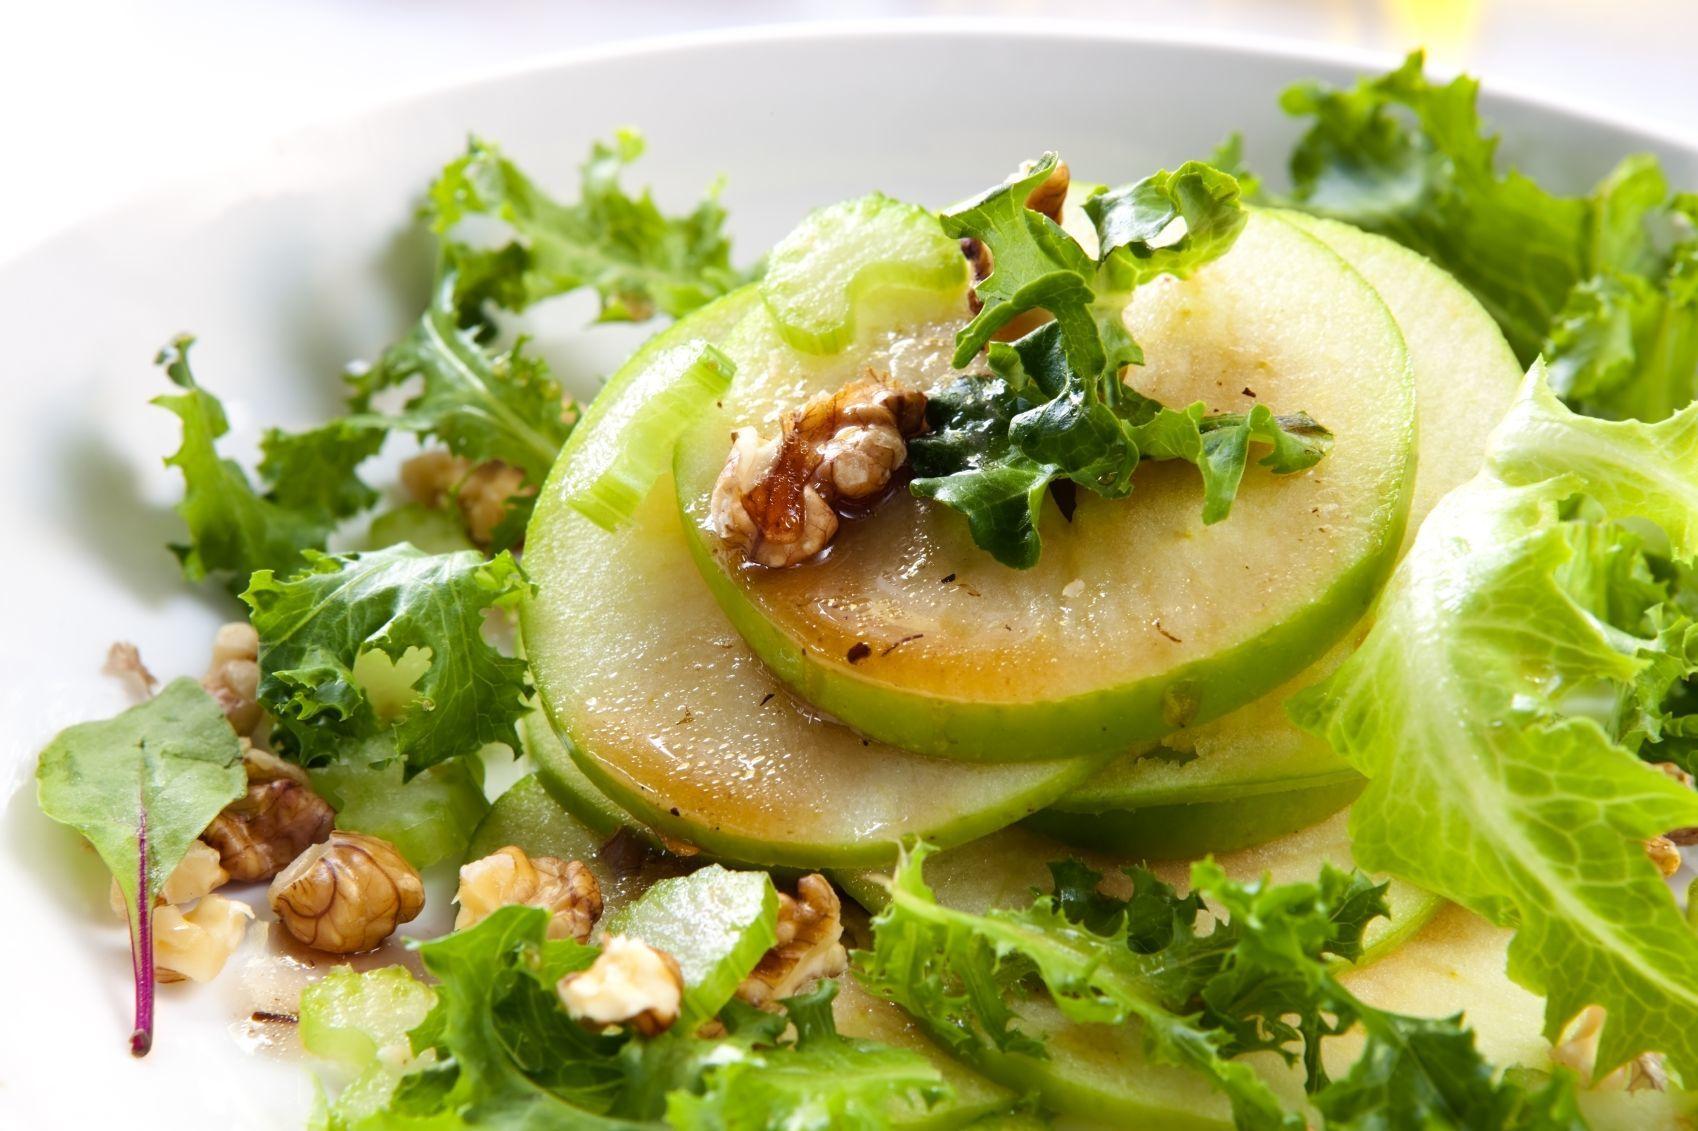 receta de ensalada de manzana cocinadelirante lechuga crespa morada nombre cientifico lechuga crespa morada propiedades